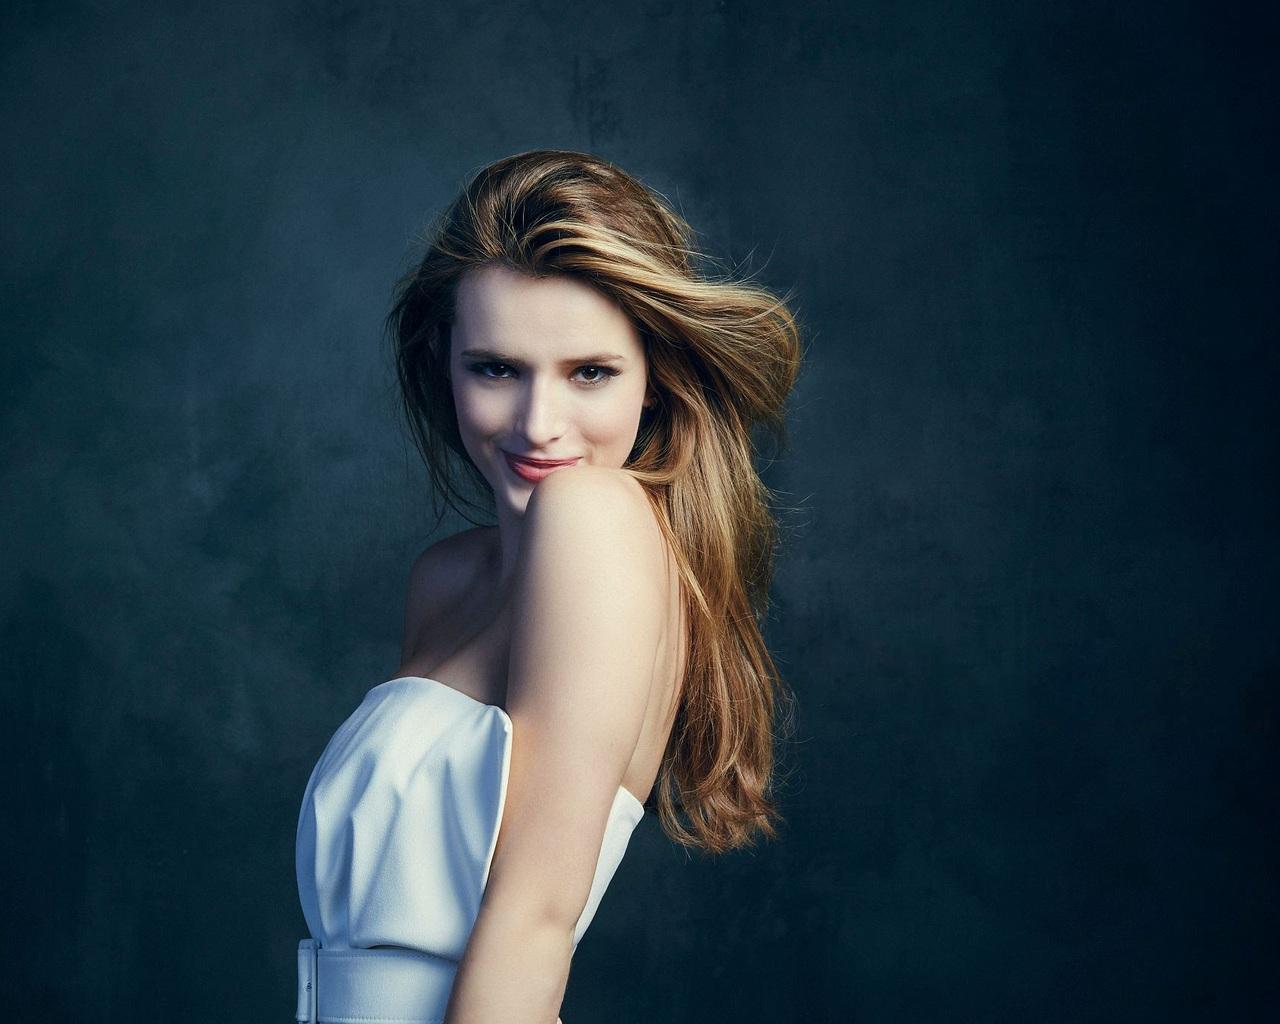 1280x1024 Beautiful Bella Thorne 1280x1024 Resolution Hd 4k